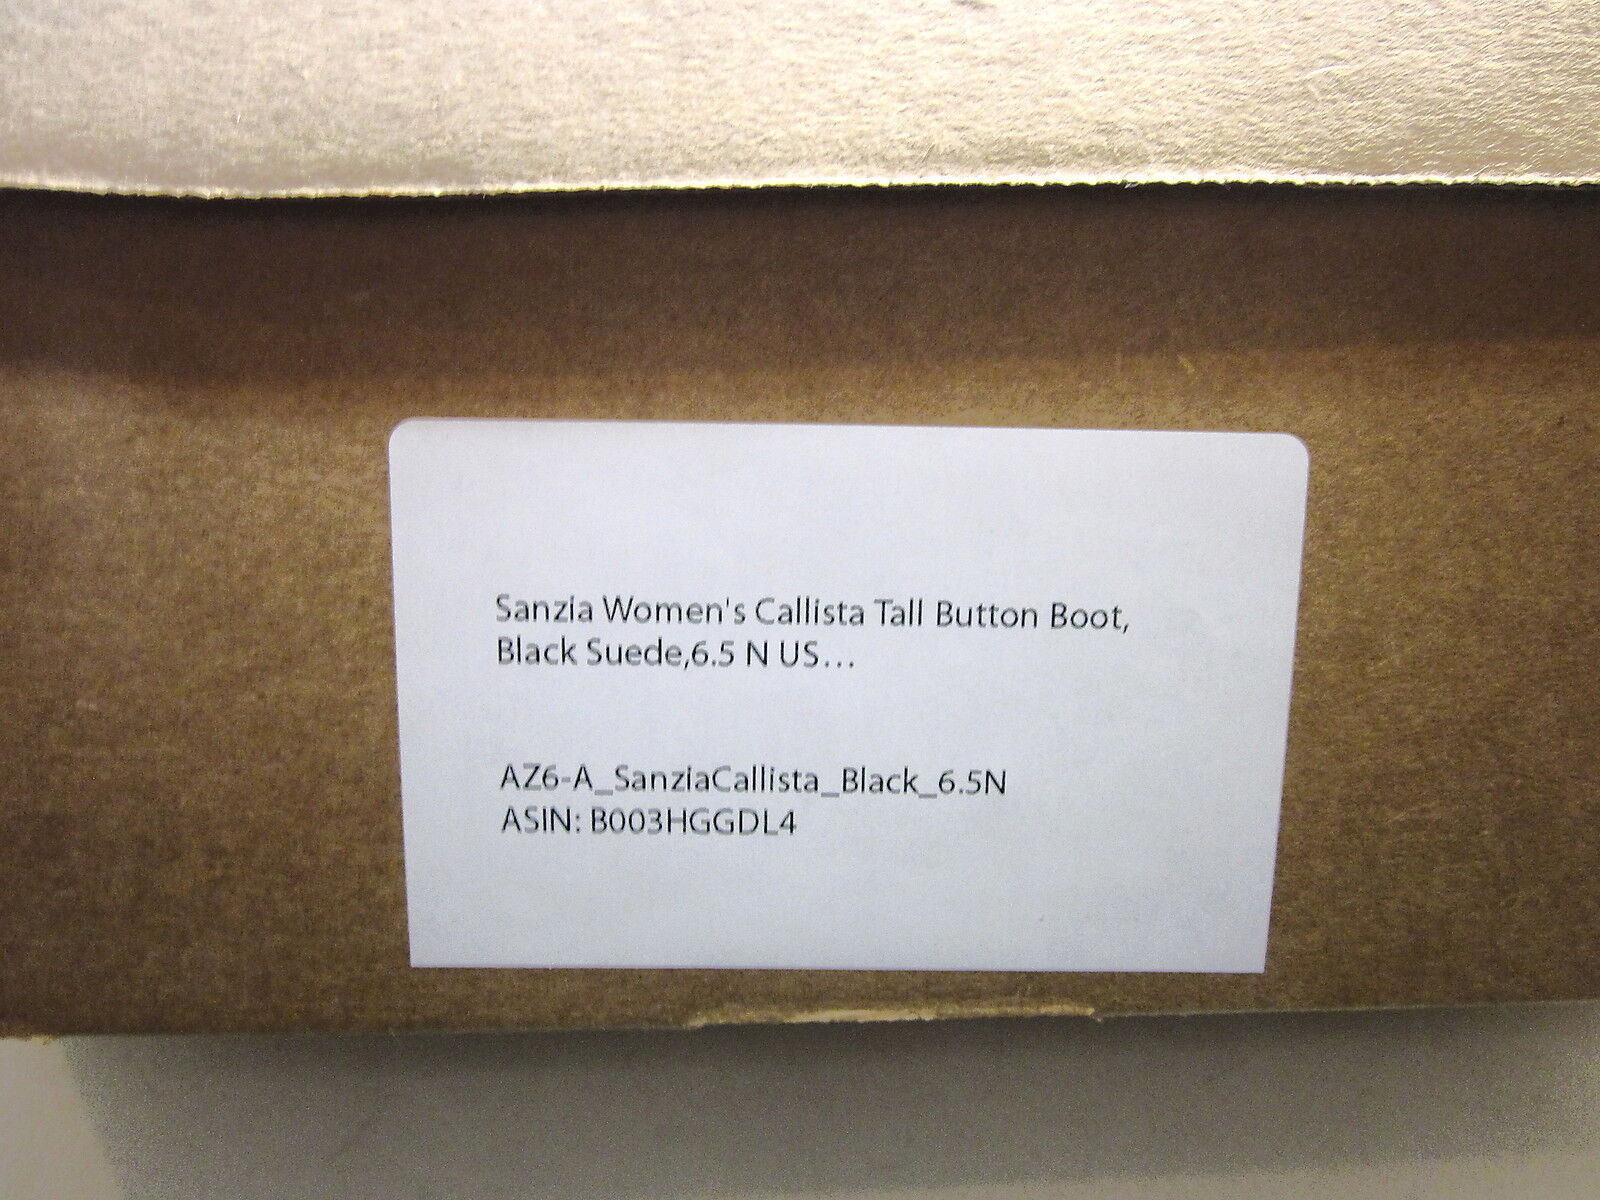 SANZIA, CALLISTA TALL BUTTON BOOT, BLACK SUEDE, WOMENS, US US US 6.5N, NEW W O BOX 071bcb